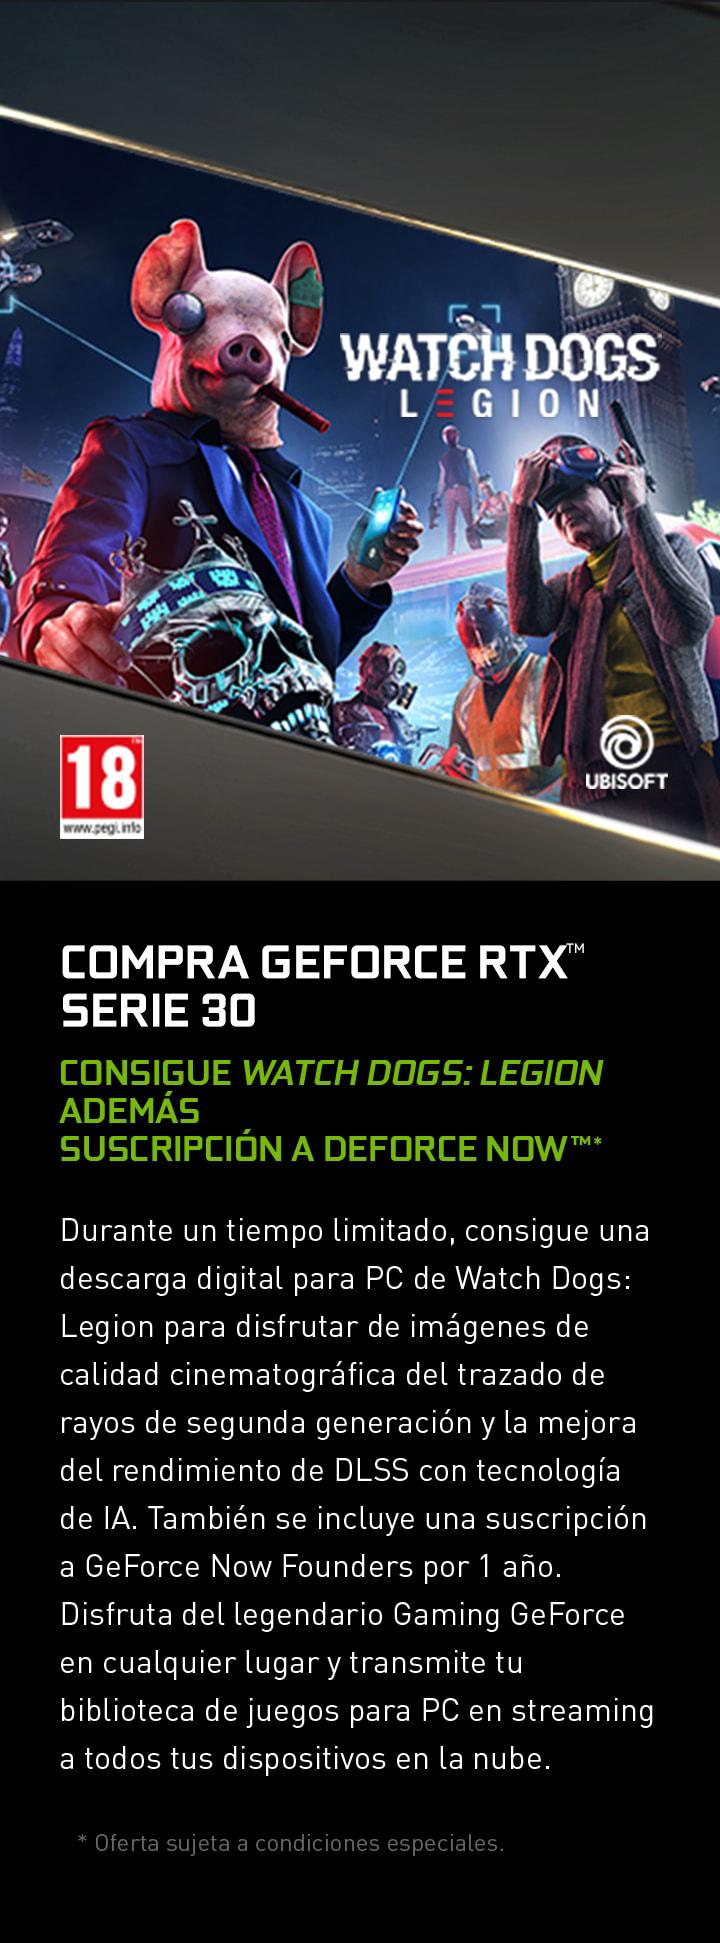 COMPRA GEFORCE RTX SERIE 30